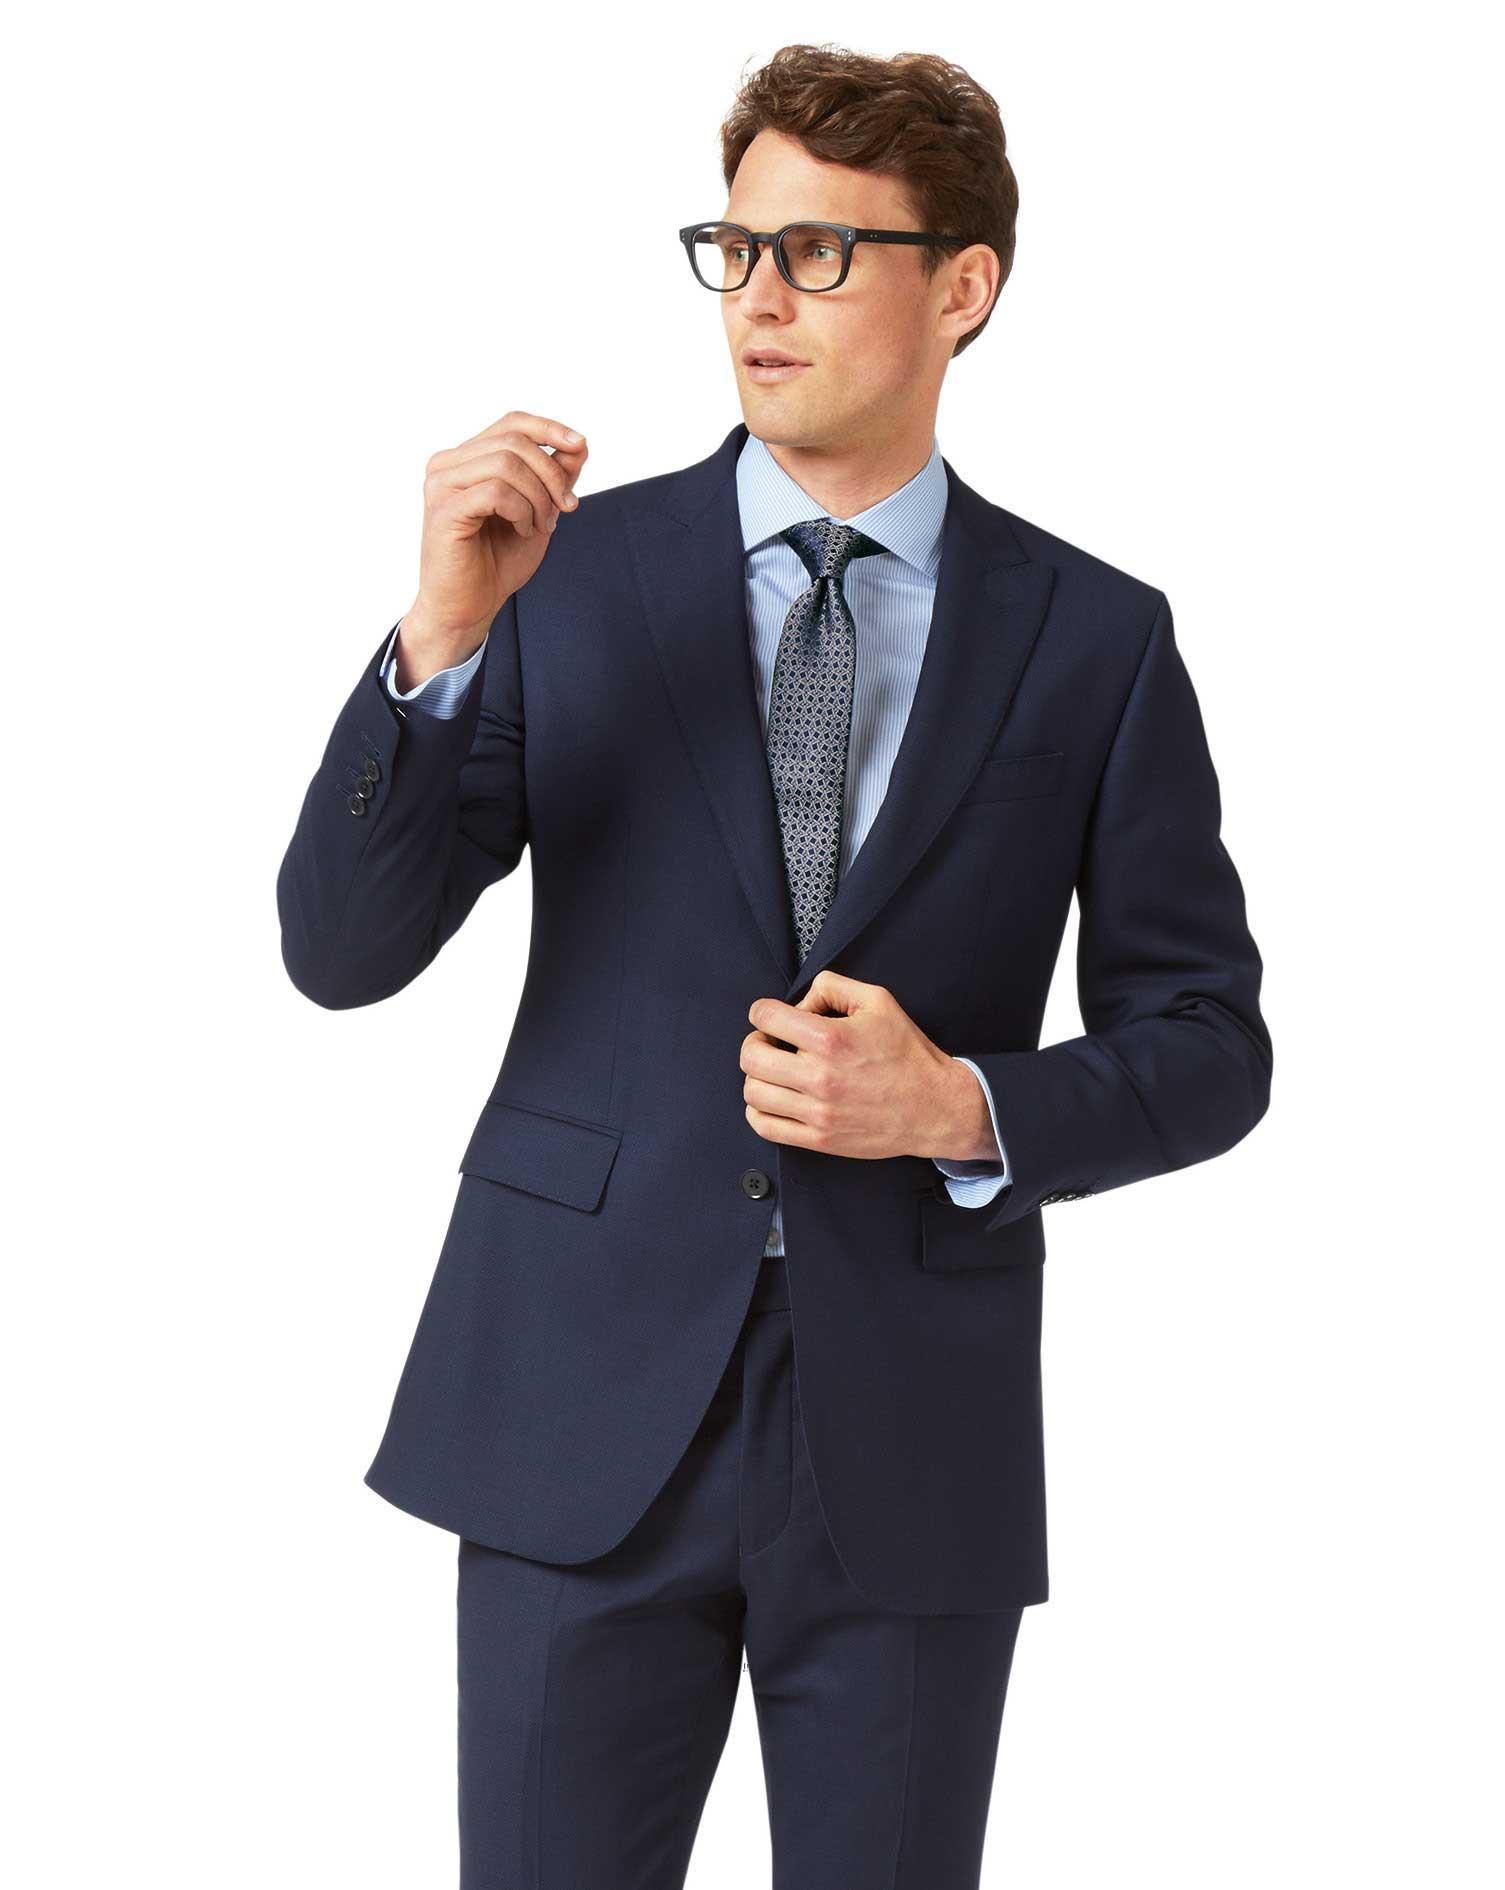 Ink Blue Slim Fit Birdseye Peak Lapel Travel Suit Wool Jacket Size 40 Regular by Charles Tyrwhitt